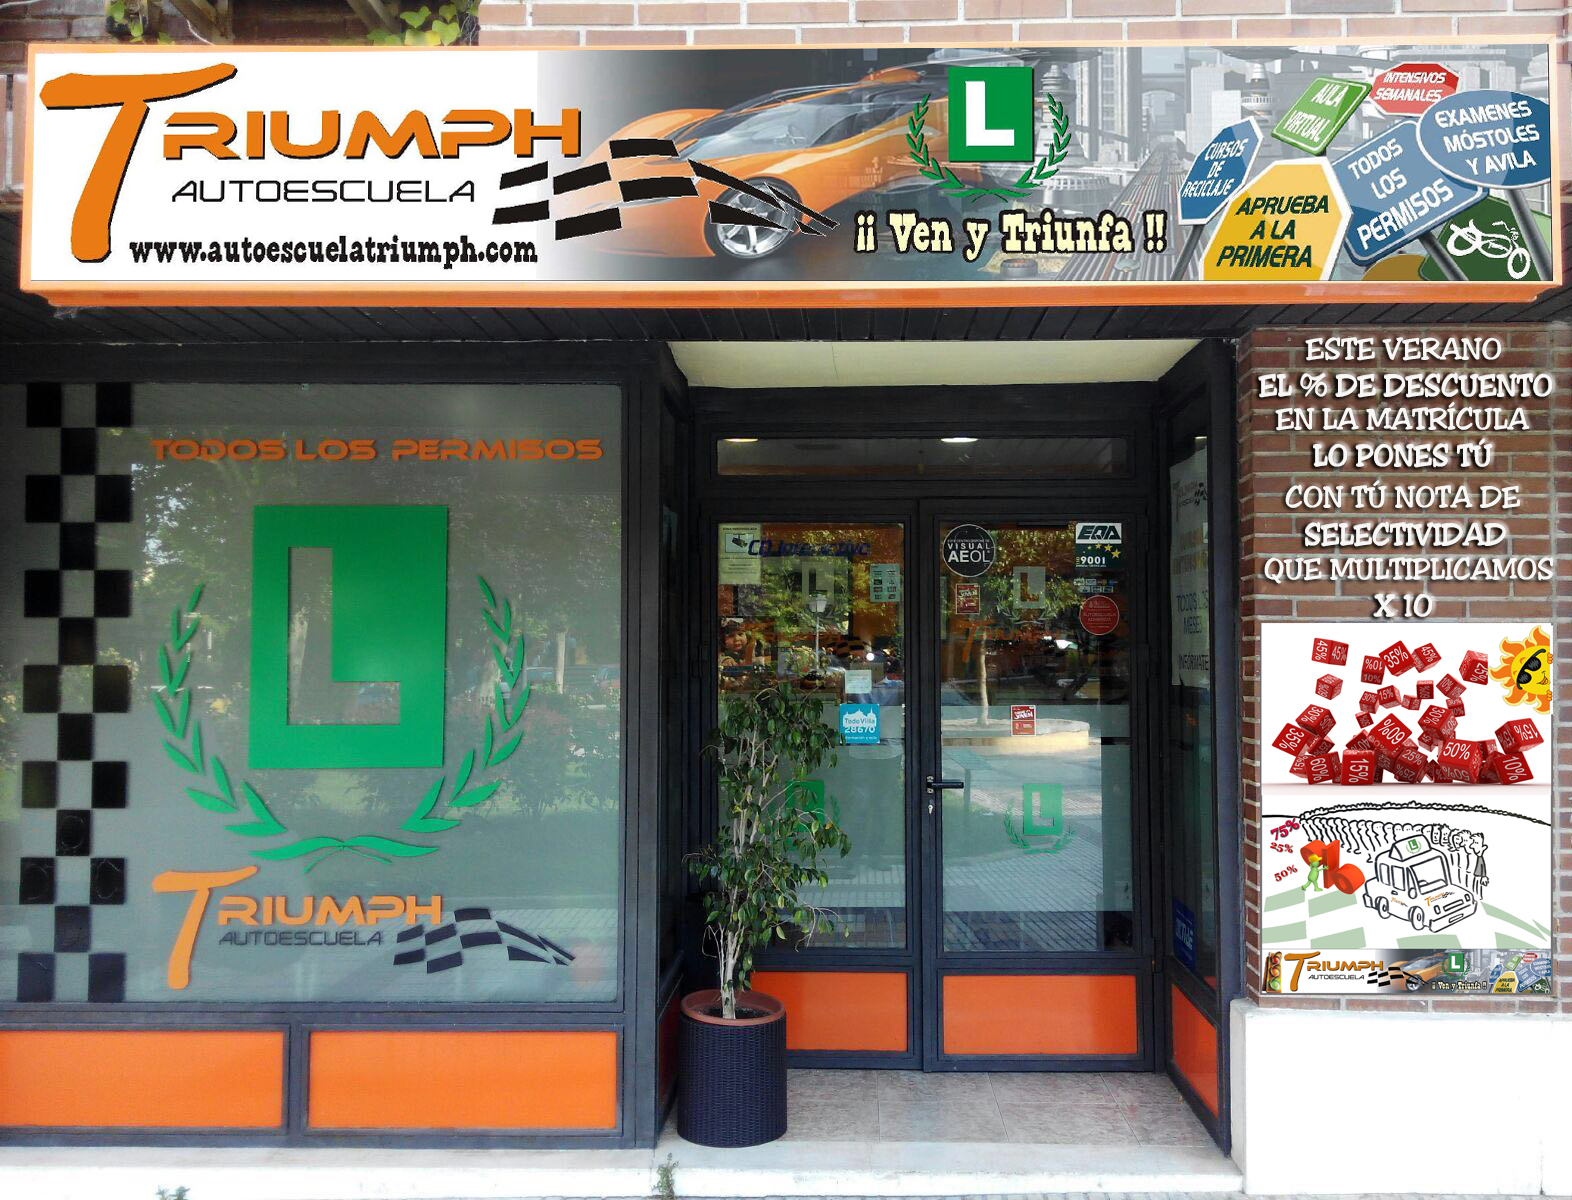 Autoescuela Triumph Villaviciosa de Odón